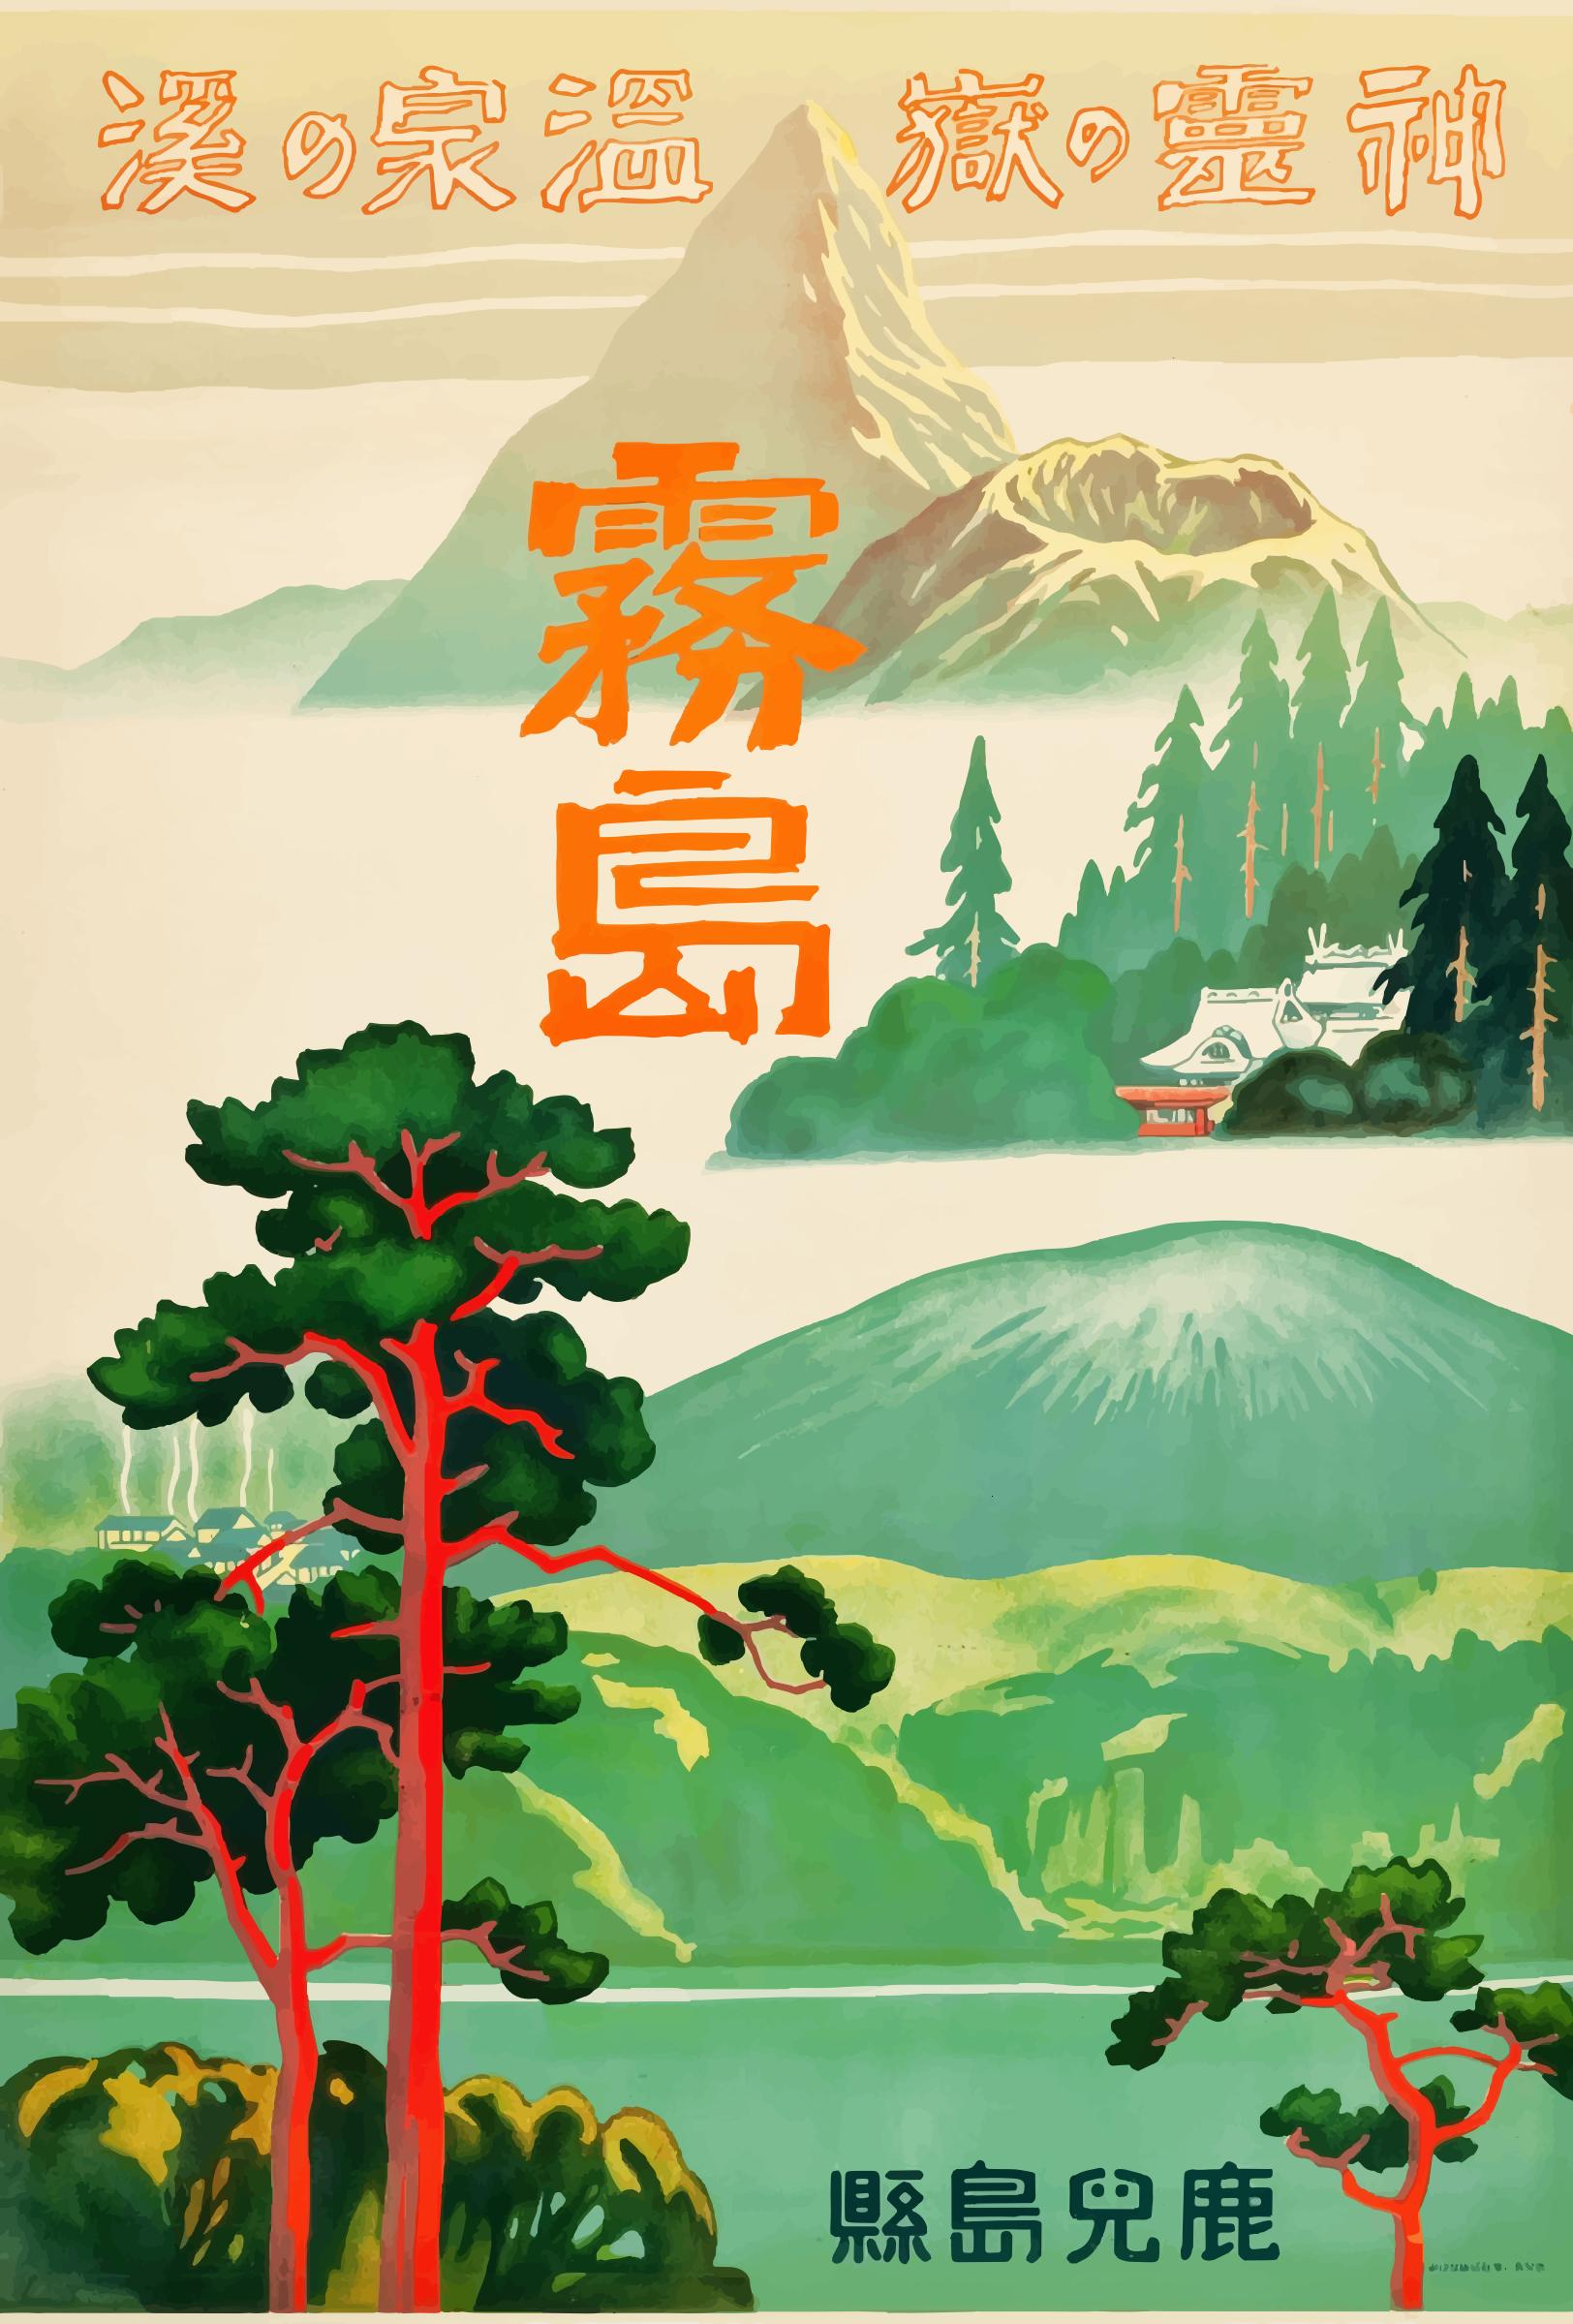 Vintage Travel Poster Japan 1930s 2 by @GDJ, Vintage Travel Poster Japan  1930s 2 from a pd image., on @openclipart